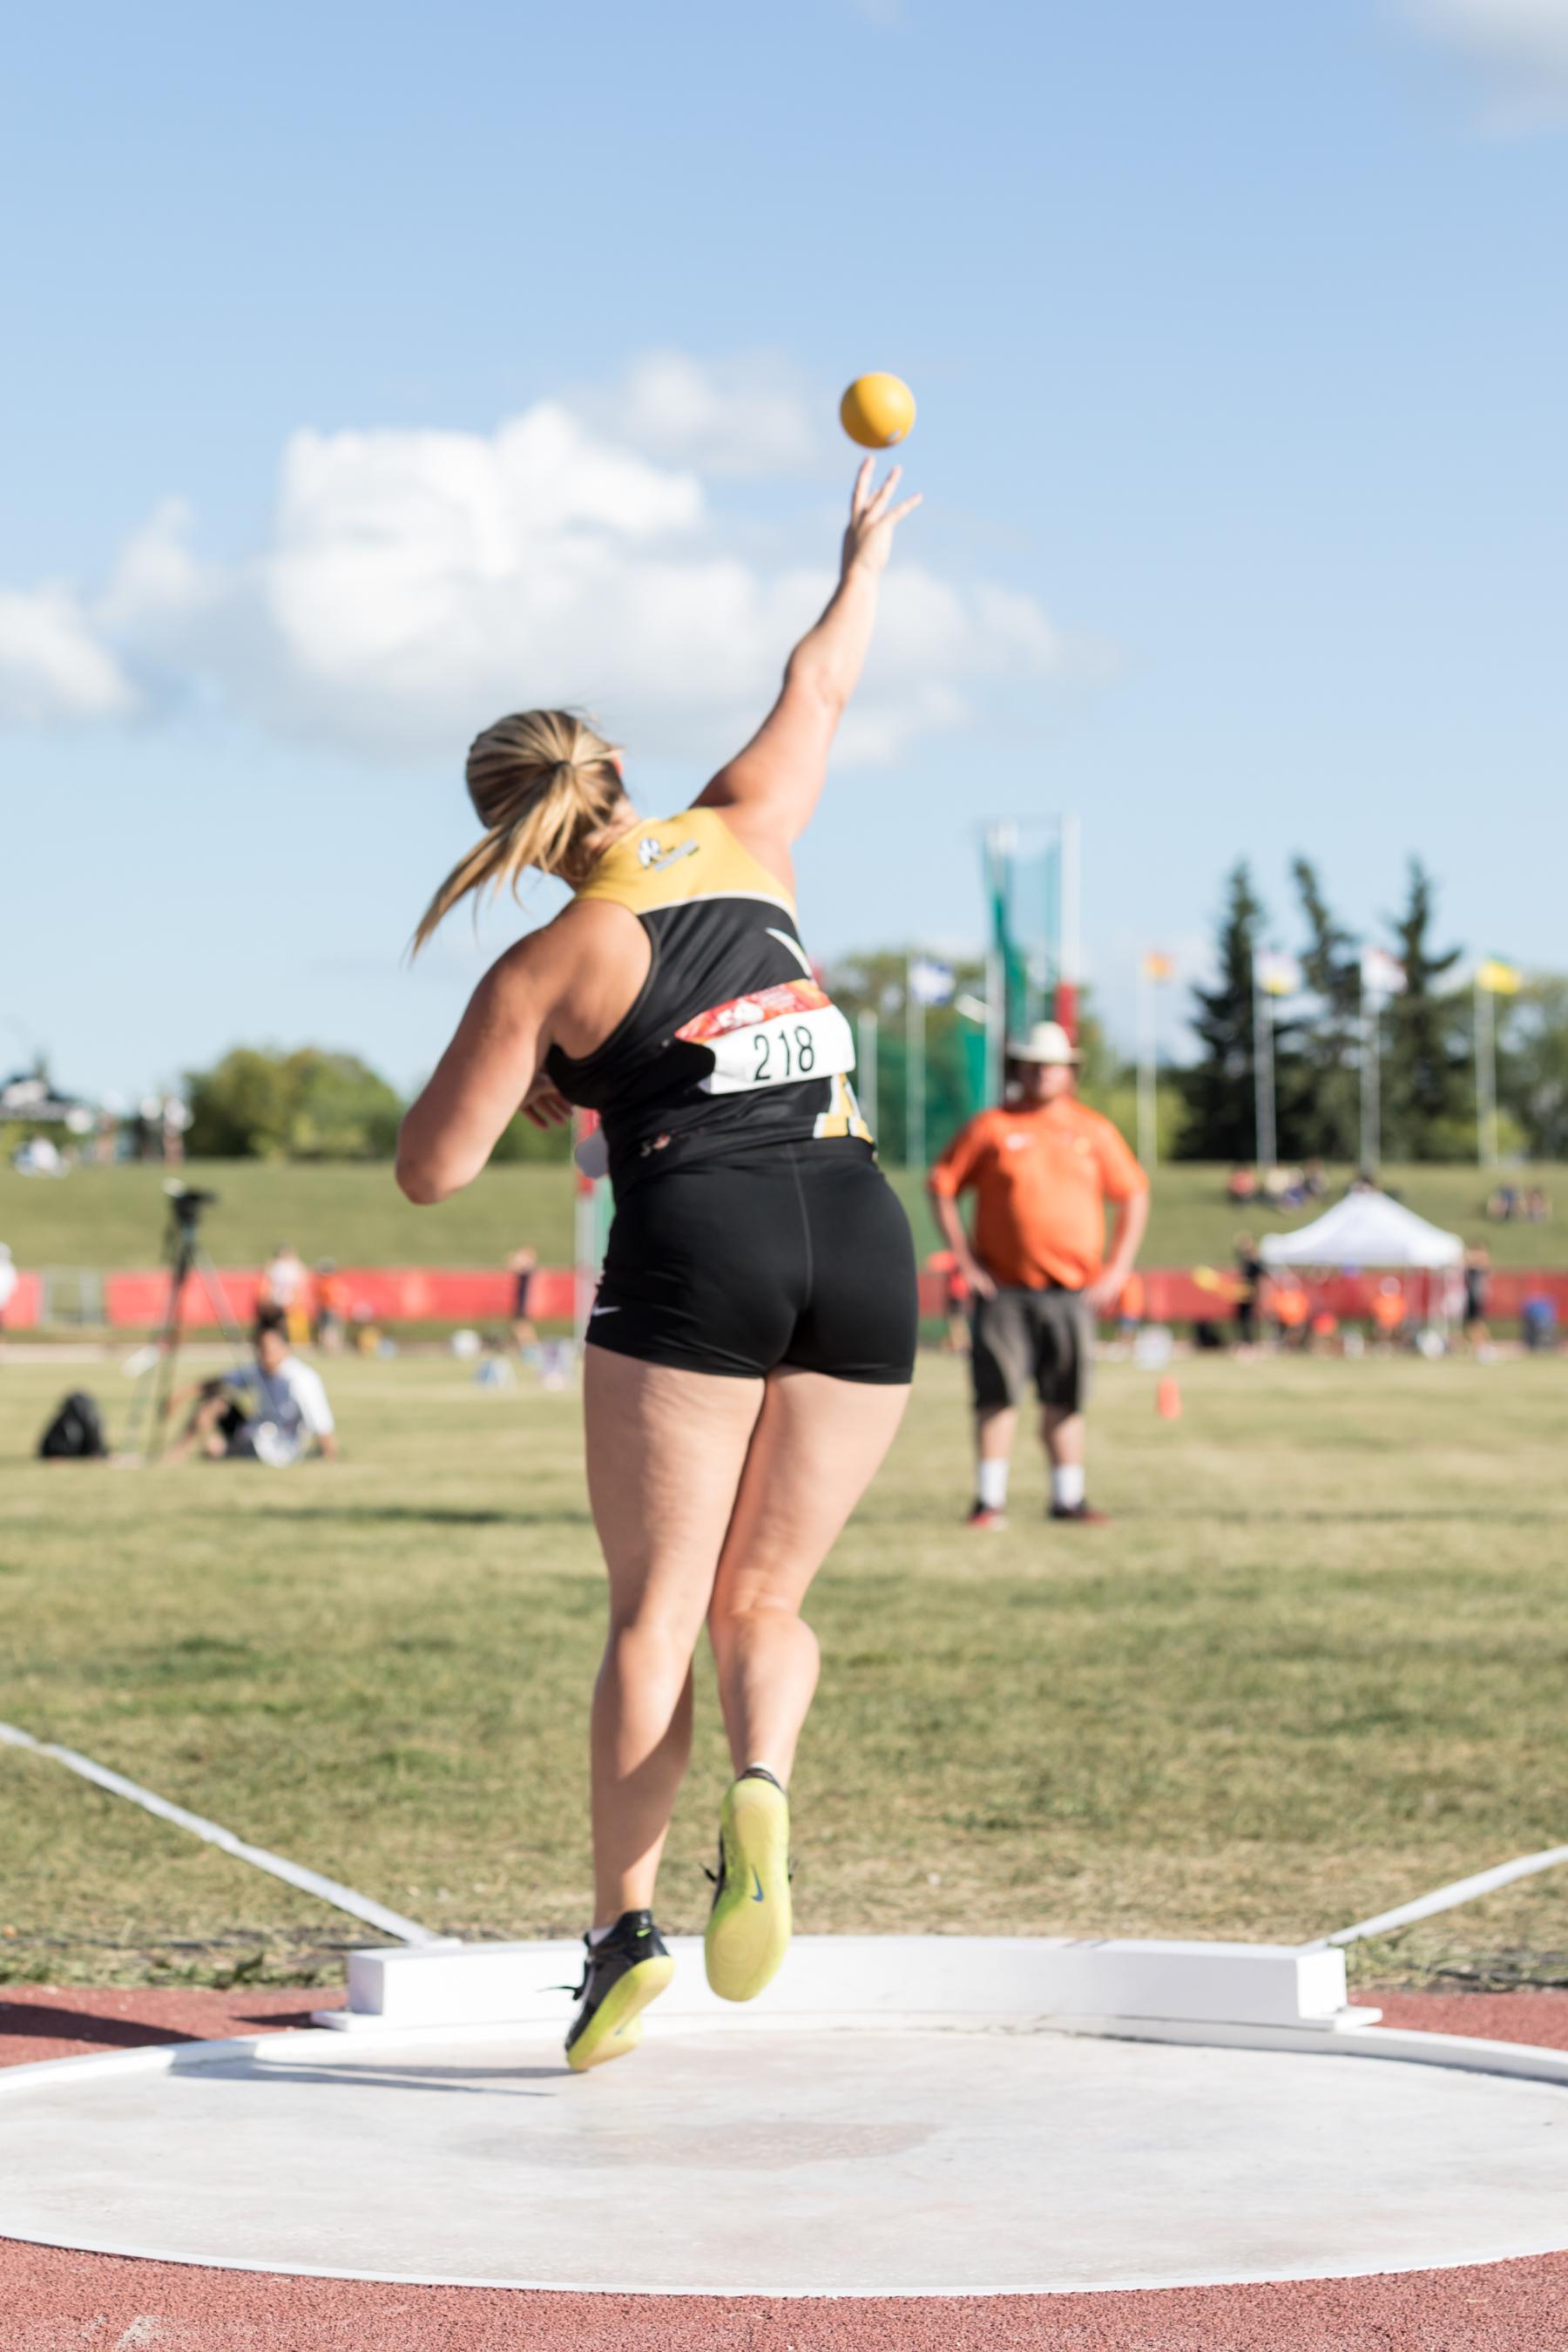 Canada Summer Games - Shot Put